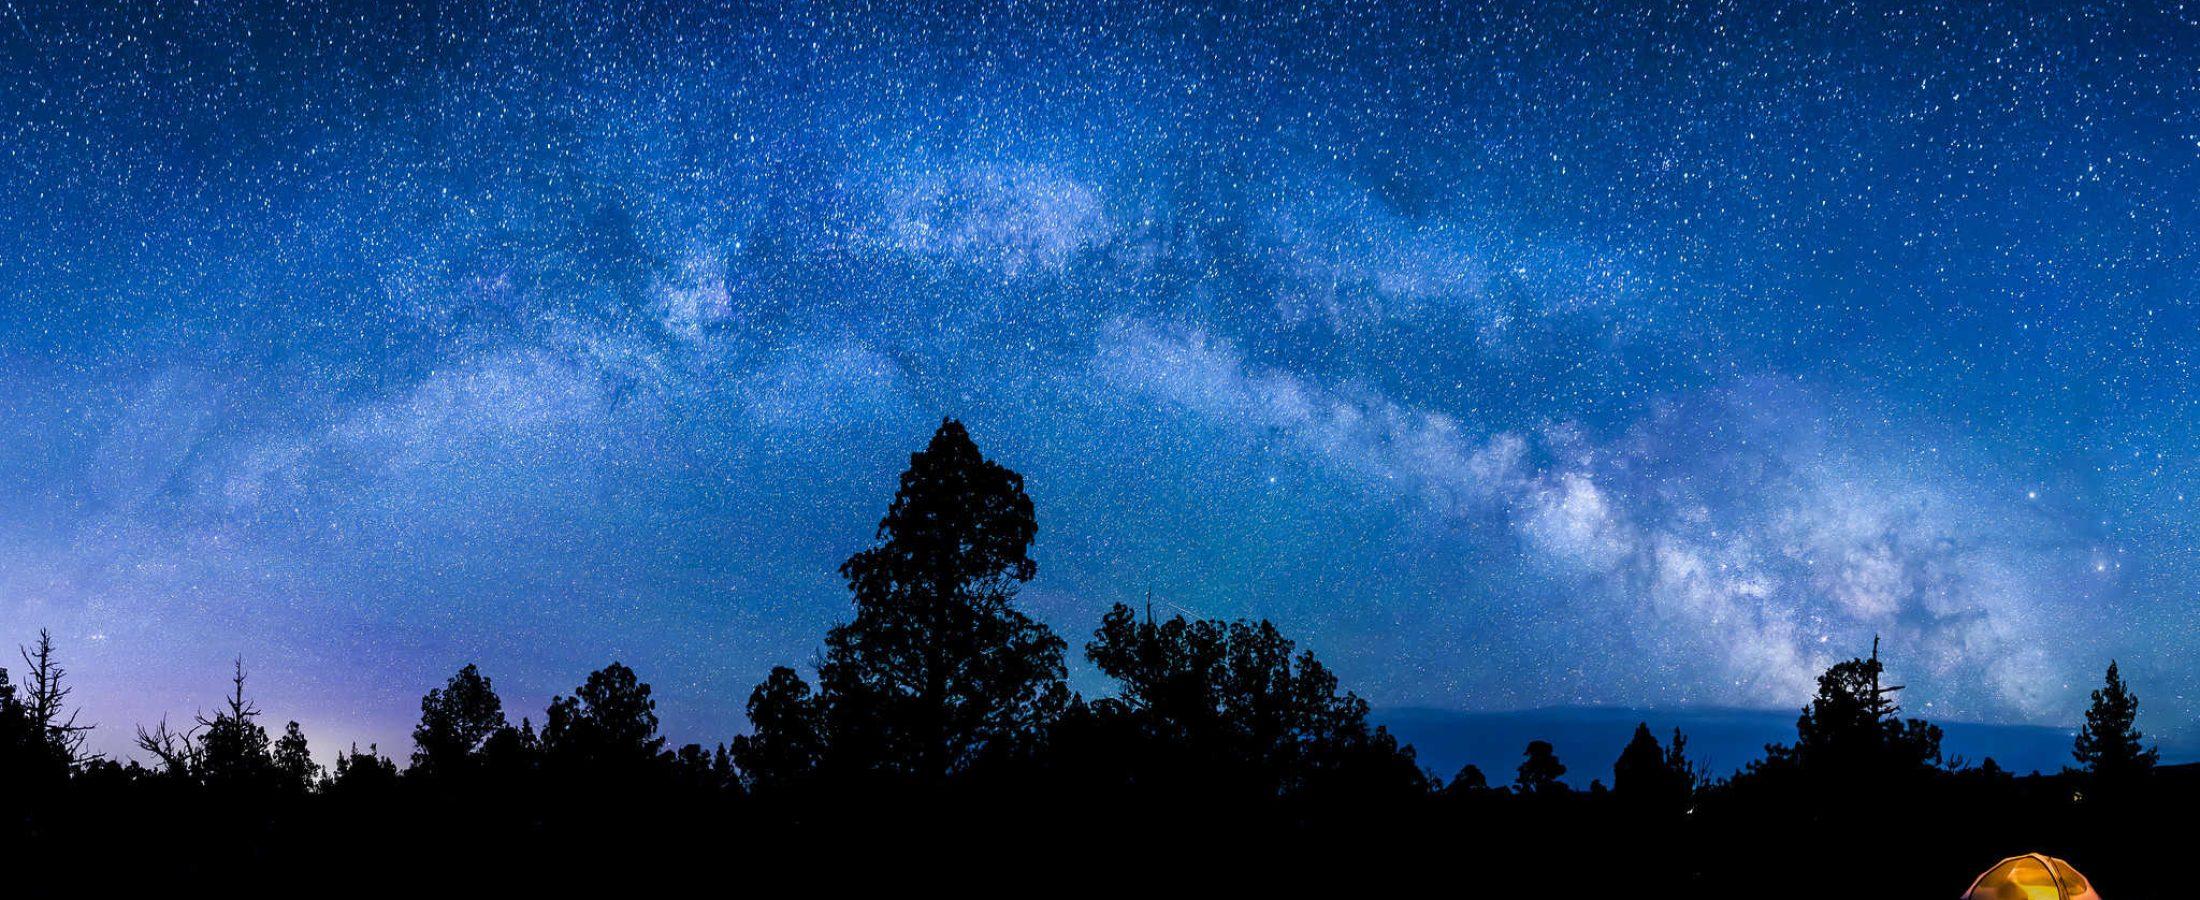 Night sky in Antelope Oregon